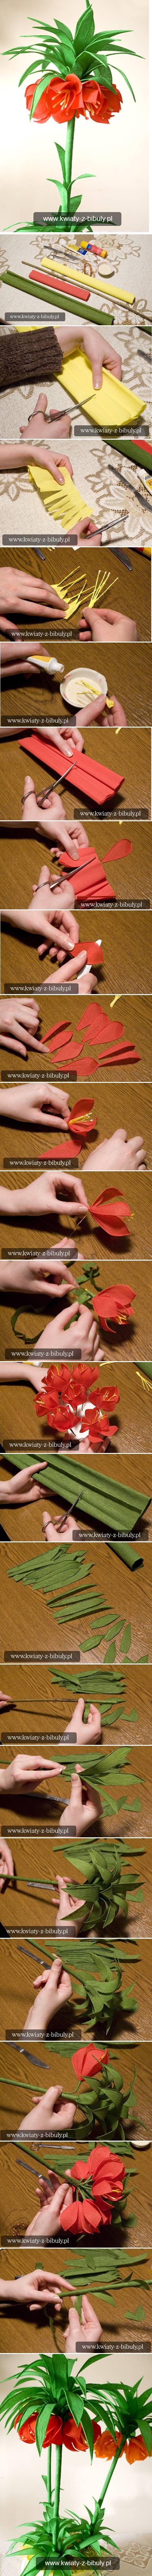 http://www.usefuldiy.com/diy-pretty-crepe-paper-flower/